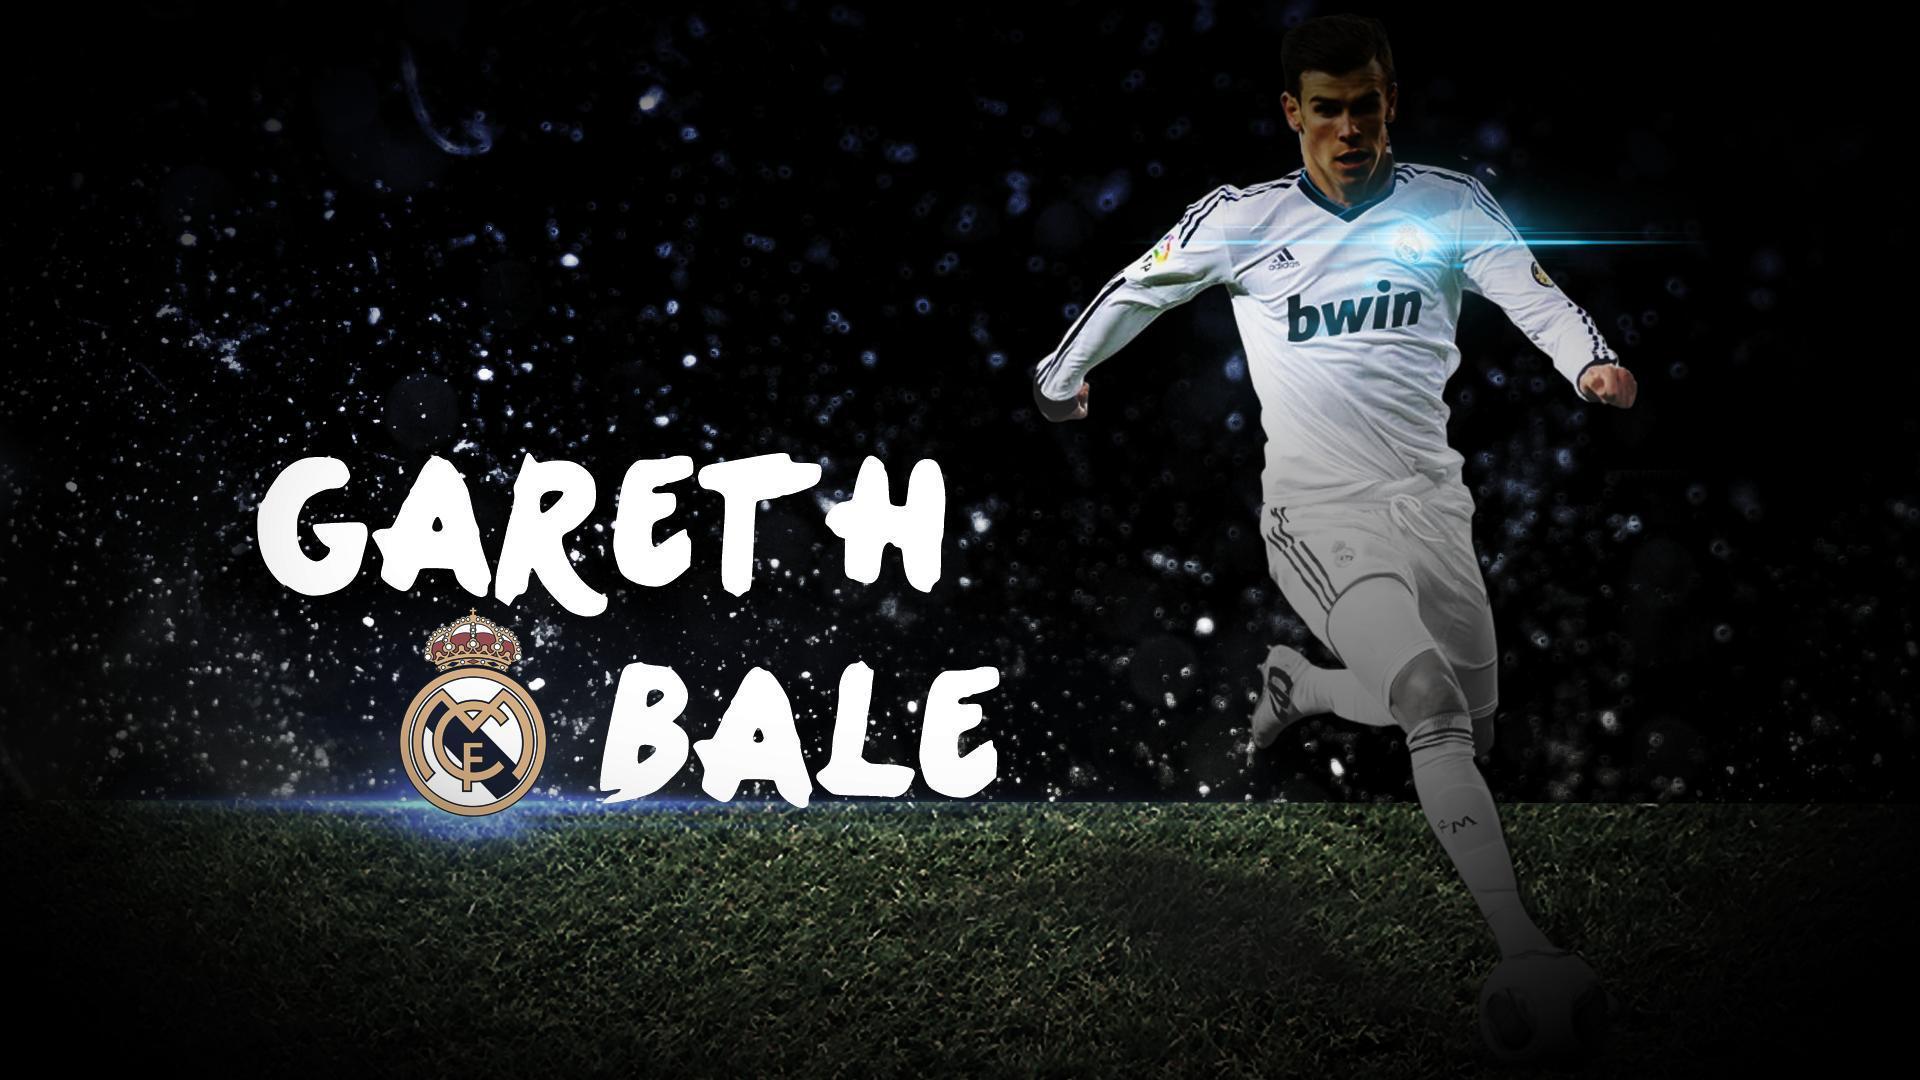 Real Madrid Top Player Gareth Bale Wallpaper 2014